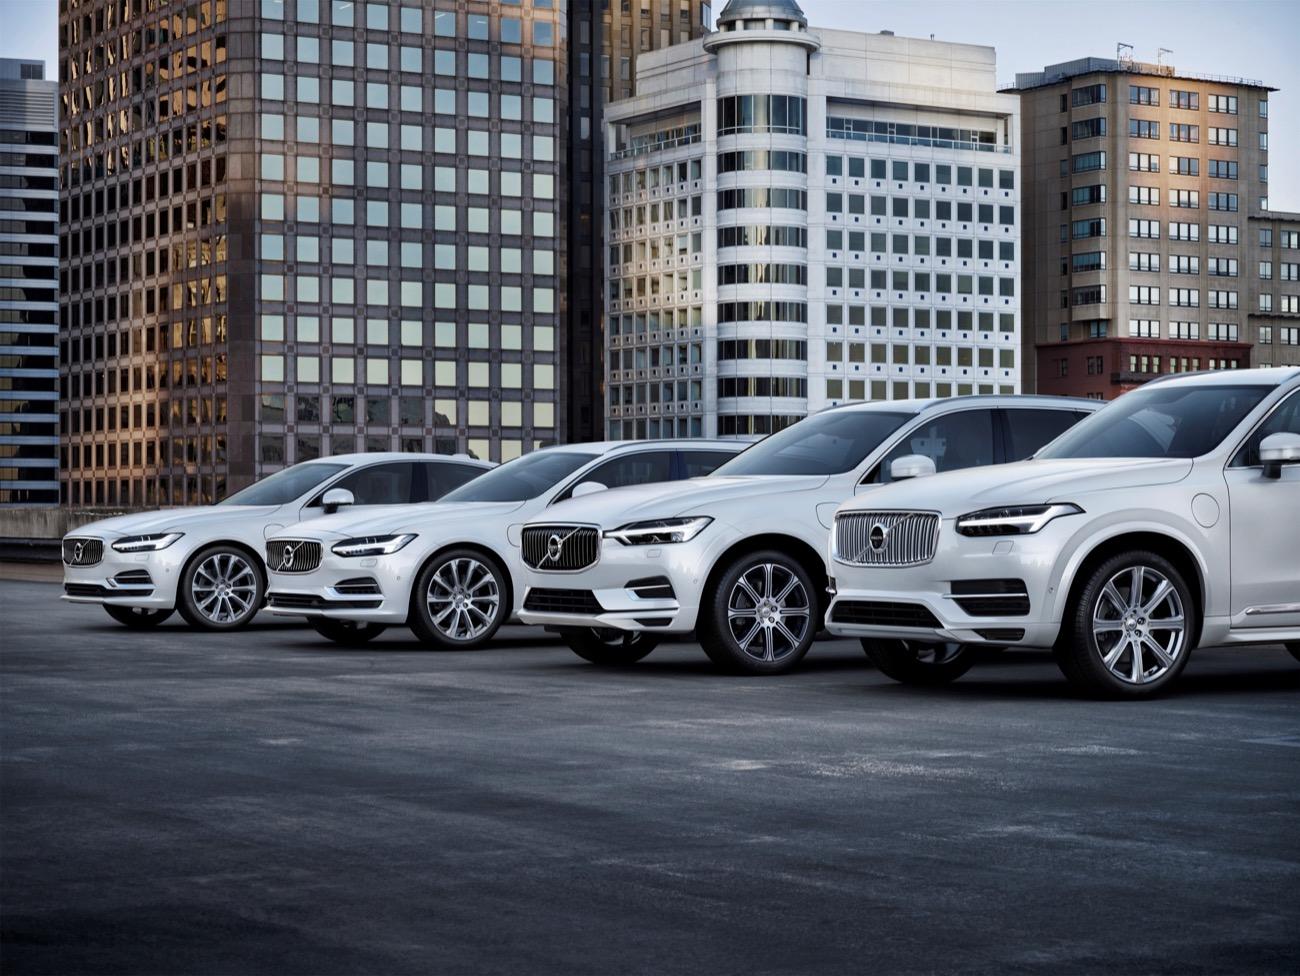 gama Volvo hibridos